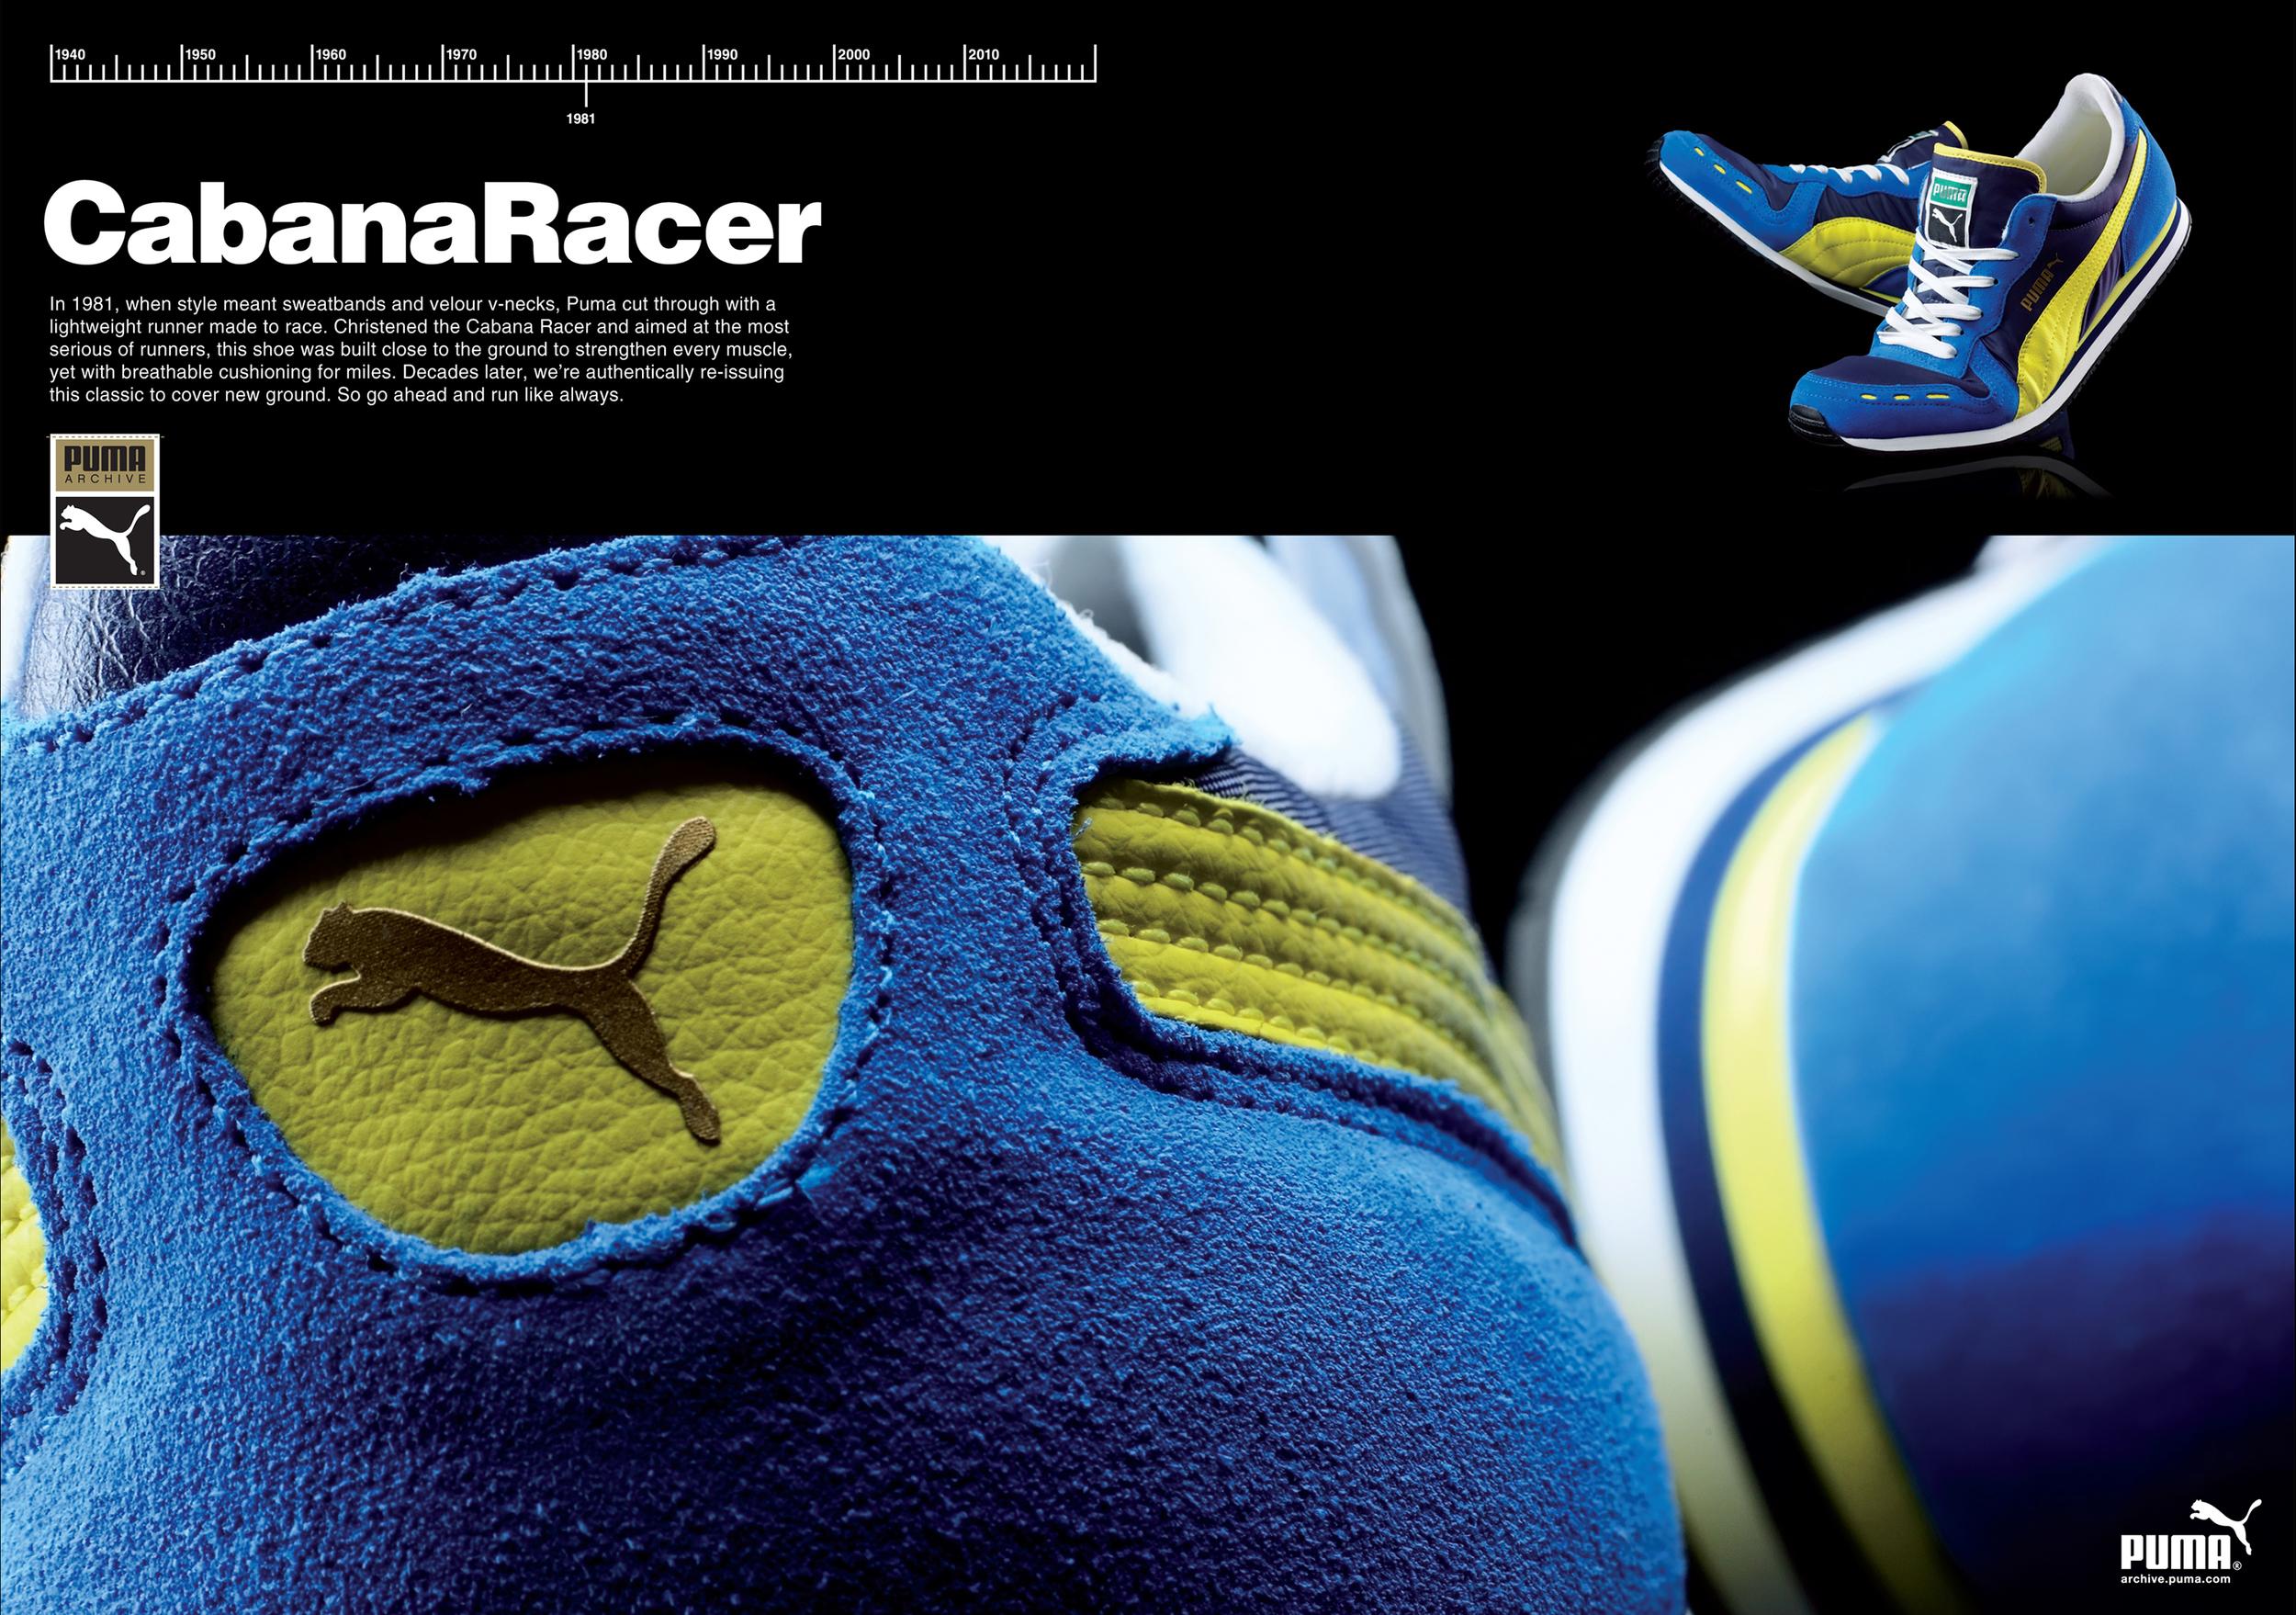 Cabana Racer Print.jpg